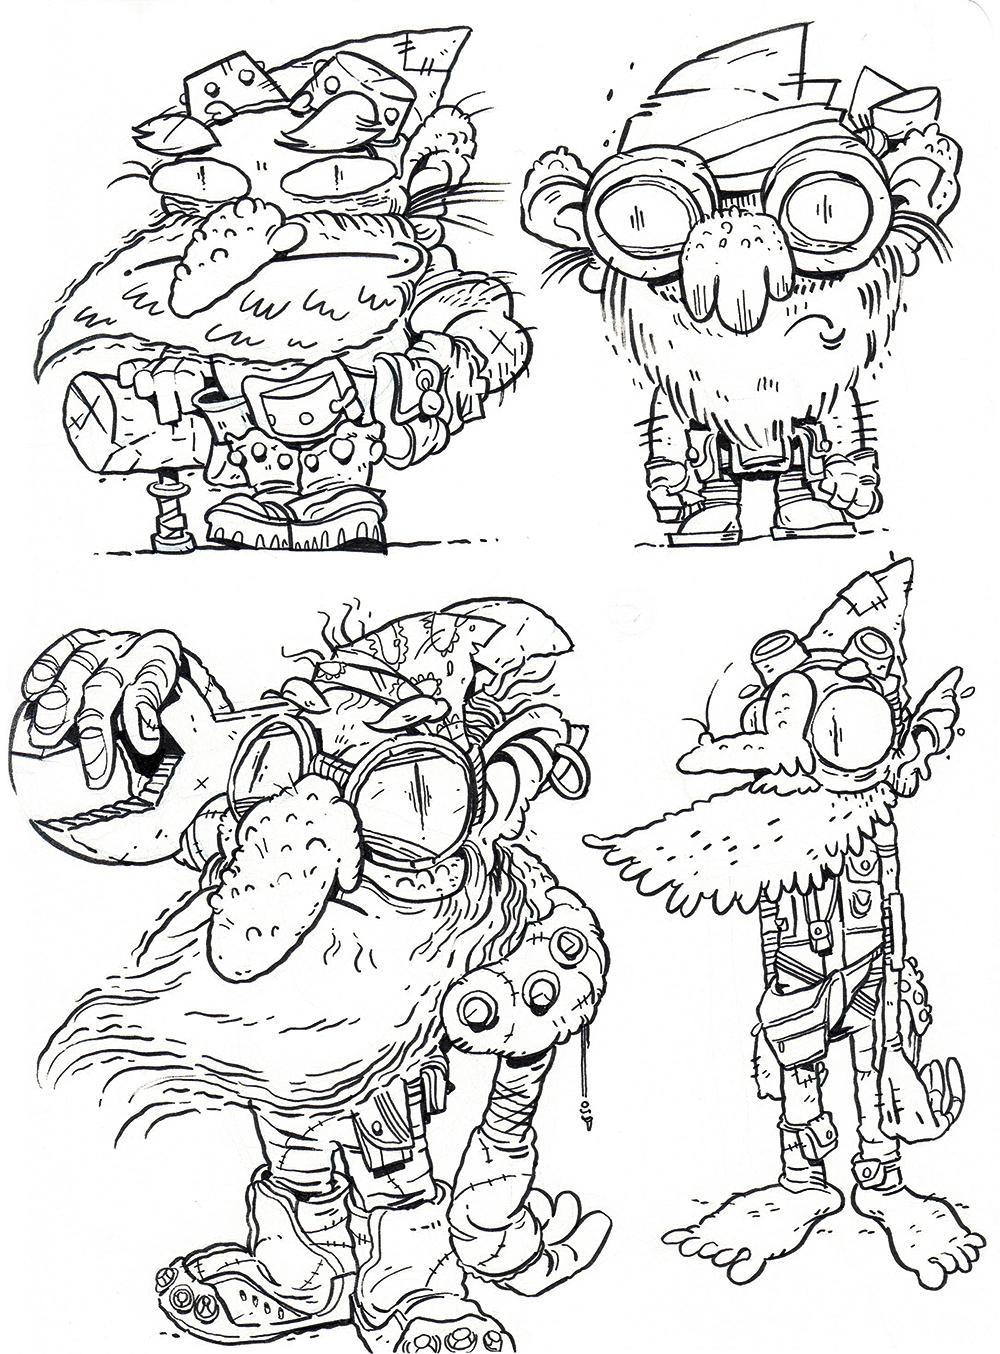 MaxBare_sketch_Gnomes_web.jpg